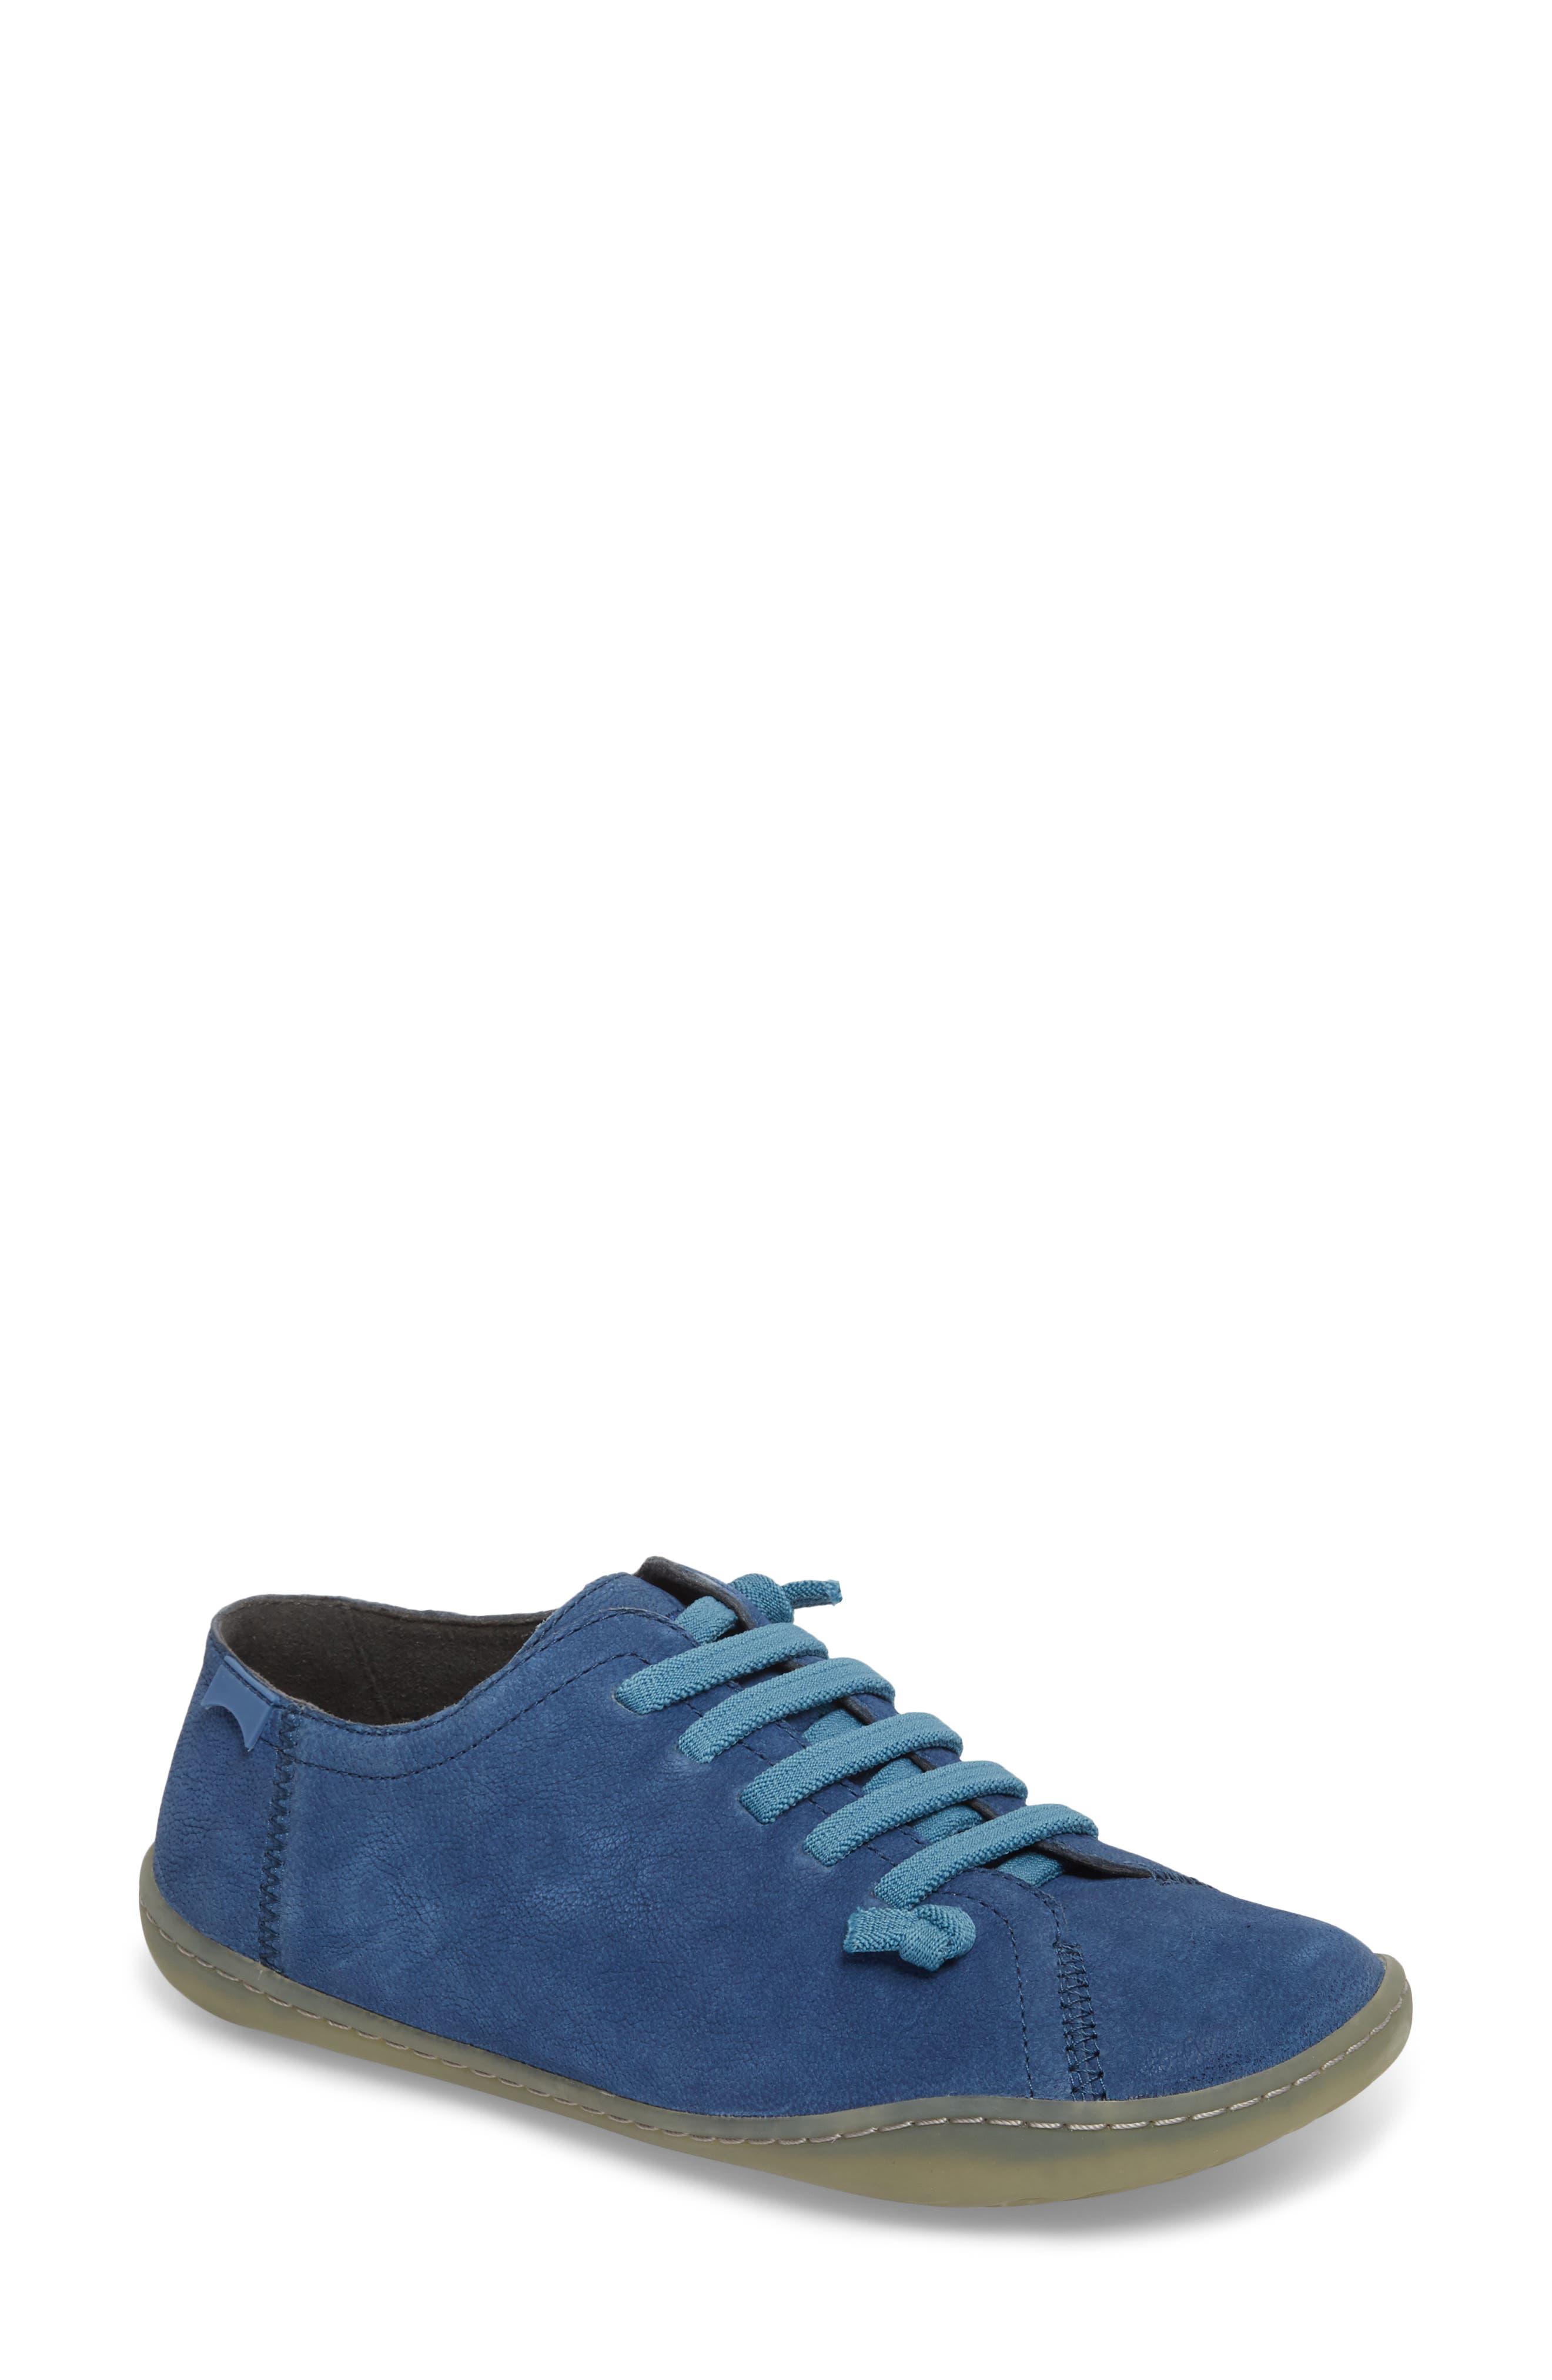 'Peu Cami' Leather Sneaker,                         Main,                         color, Medium Blue Suede